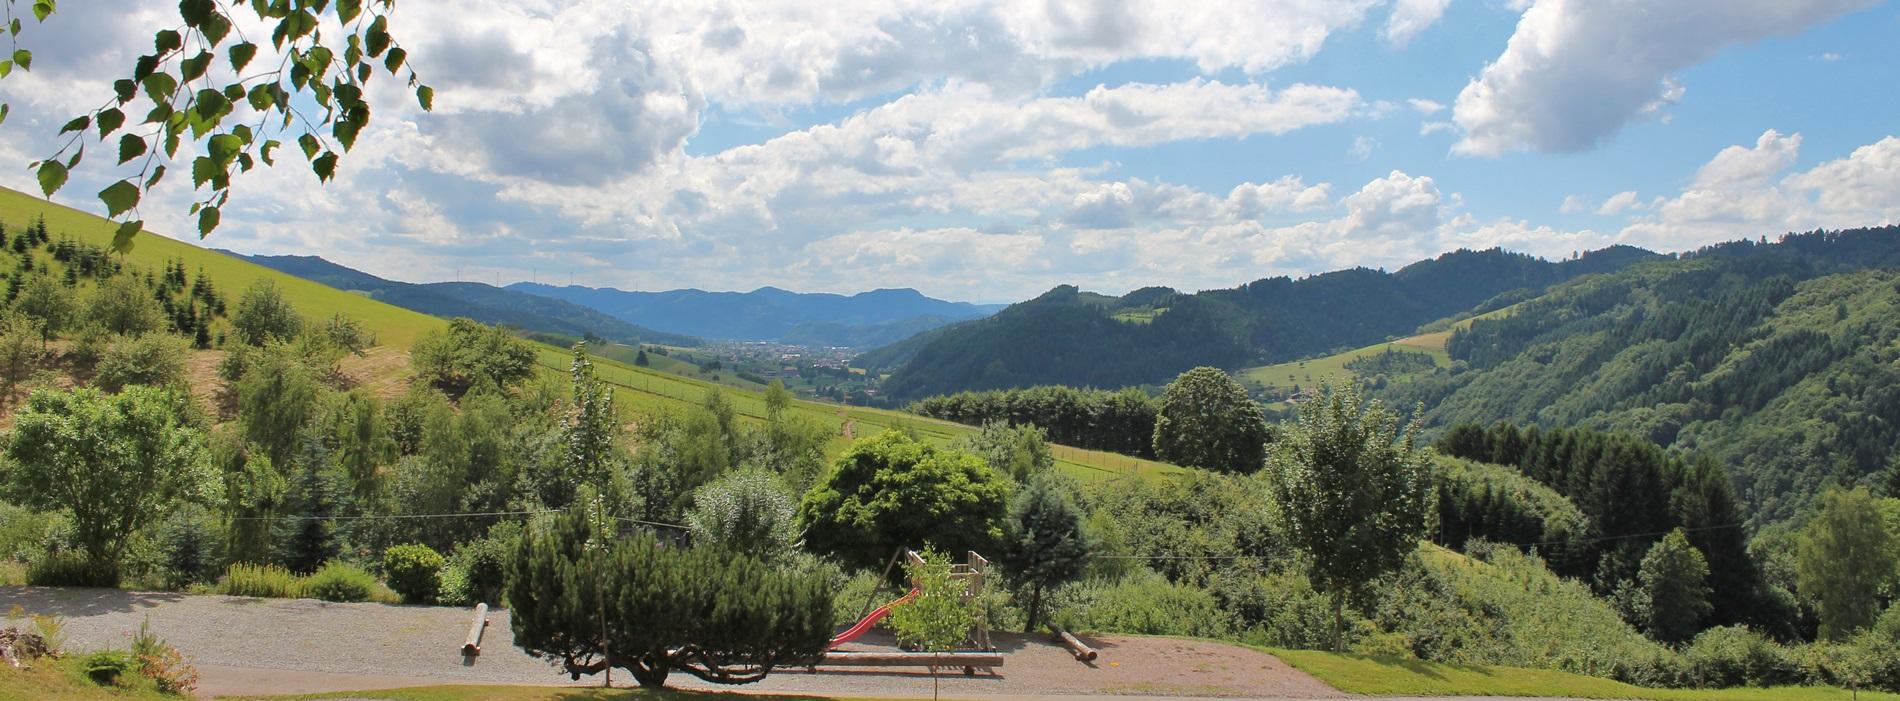 Ausblick Hubhof Oberharmersbach Schwarzwald